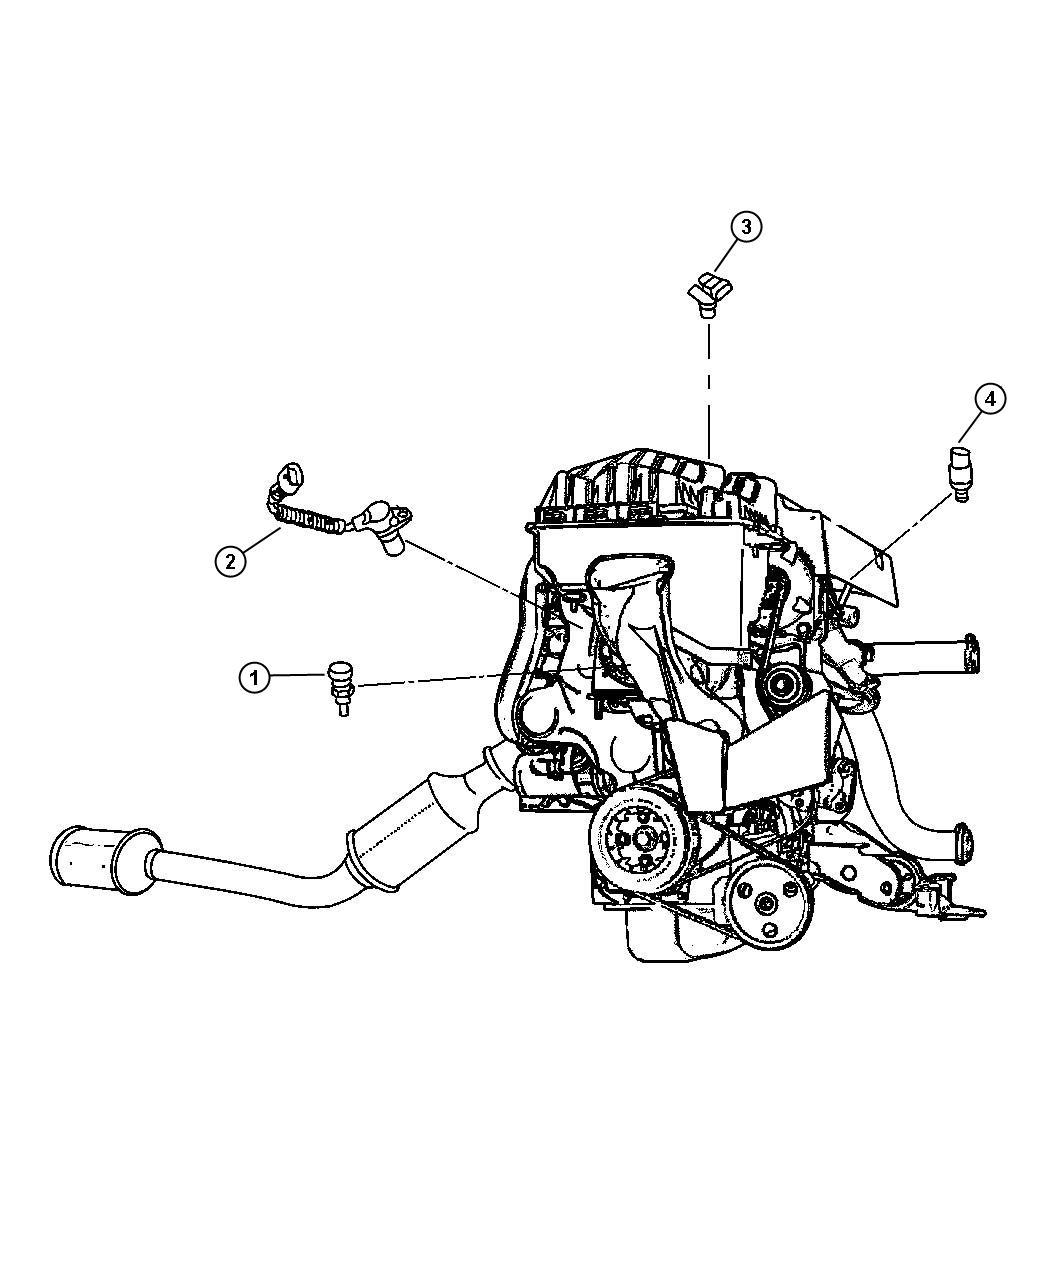 Hh 4403  3 4 3400 Engine Diagram Wiring Diagram